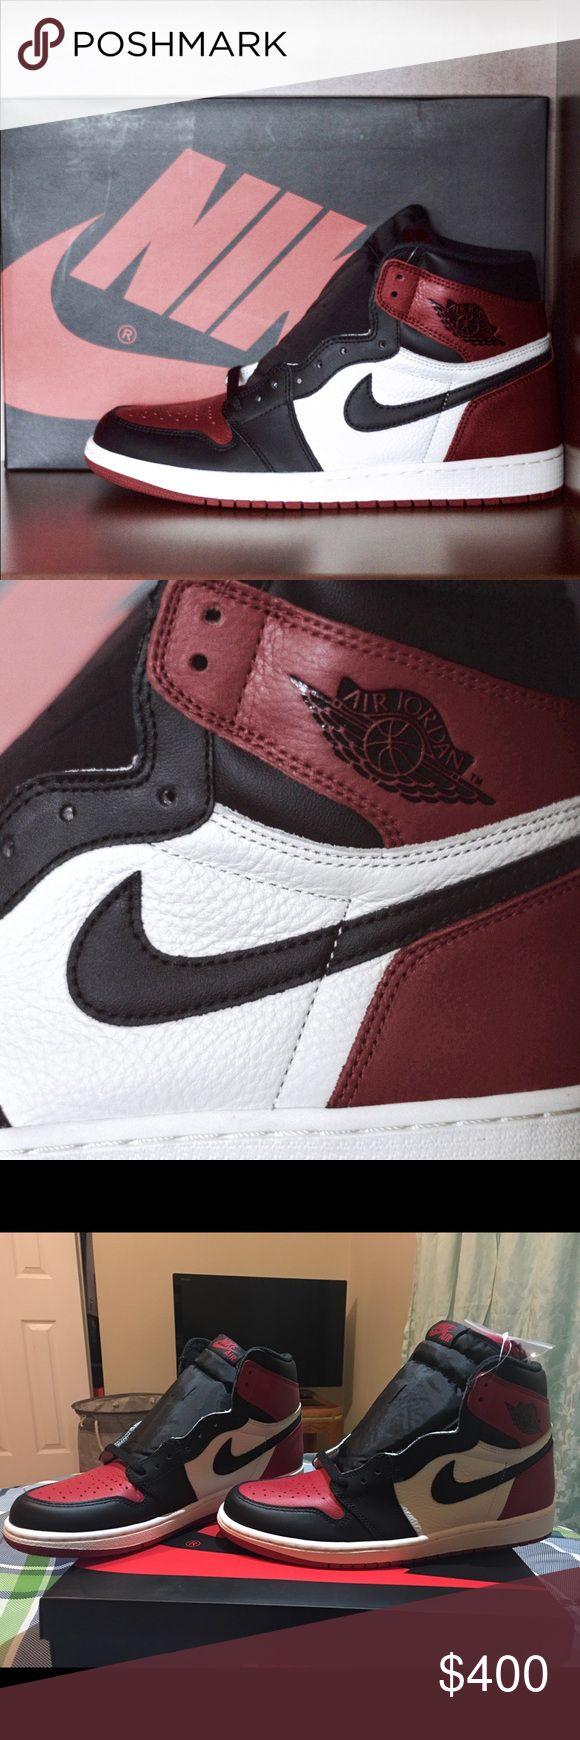 Air Jordan 1 Bred Toe Dead stock & 💯 Authentic! Jordan Shoes Sneakers